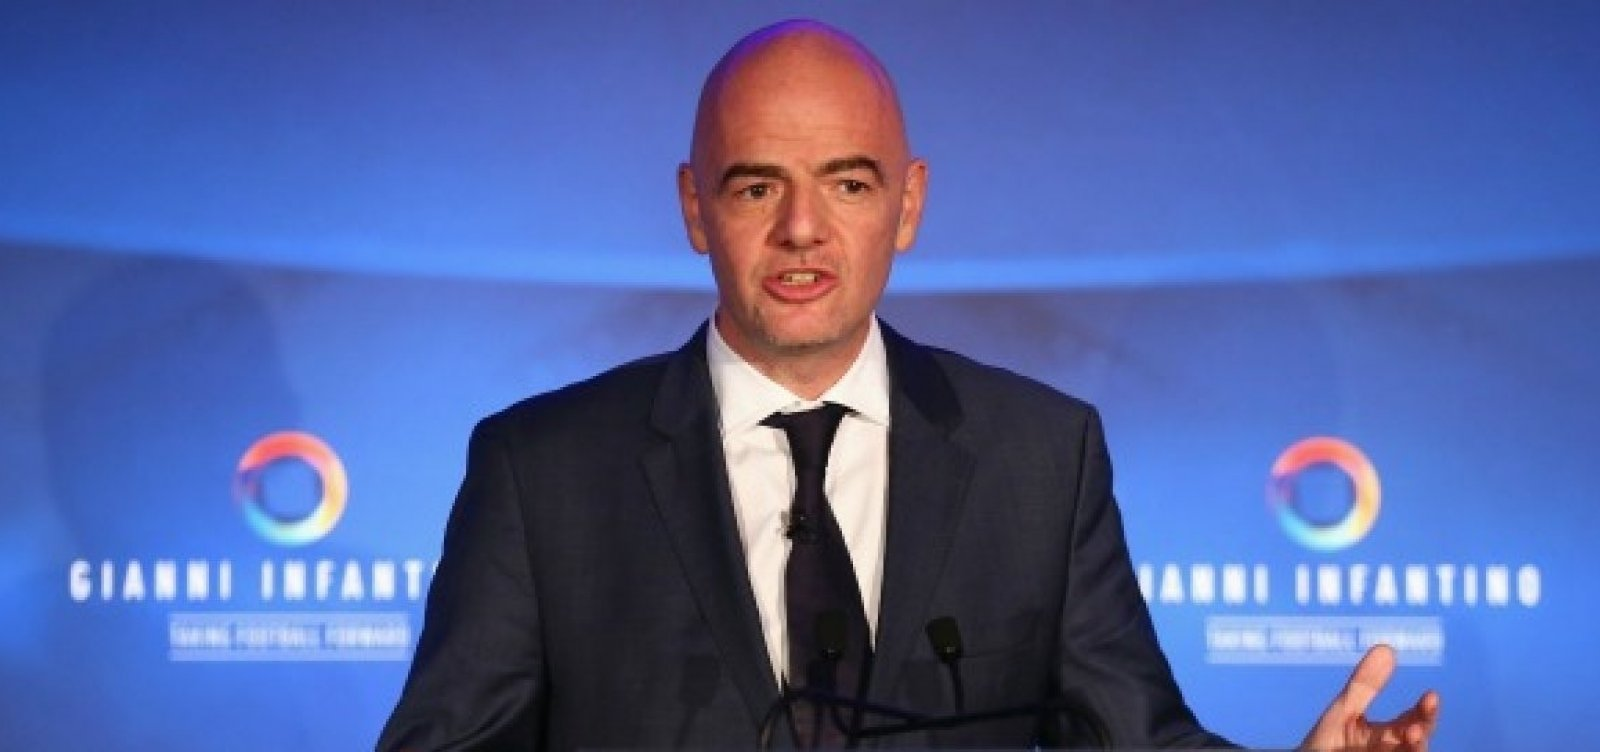 [Presidente da Fifa favoreceu Manchester City e PSG, aponta Football Leaks]